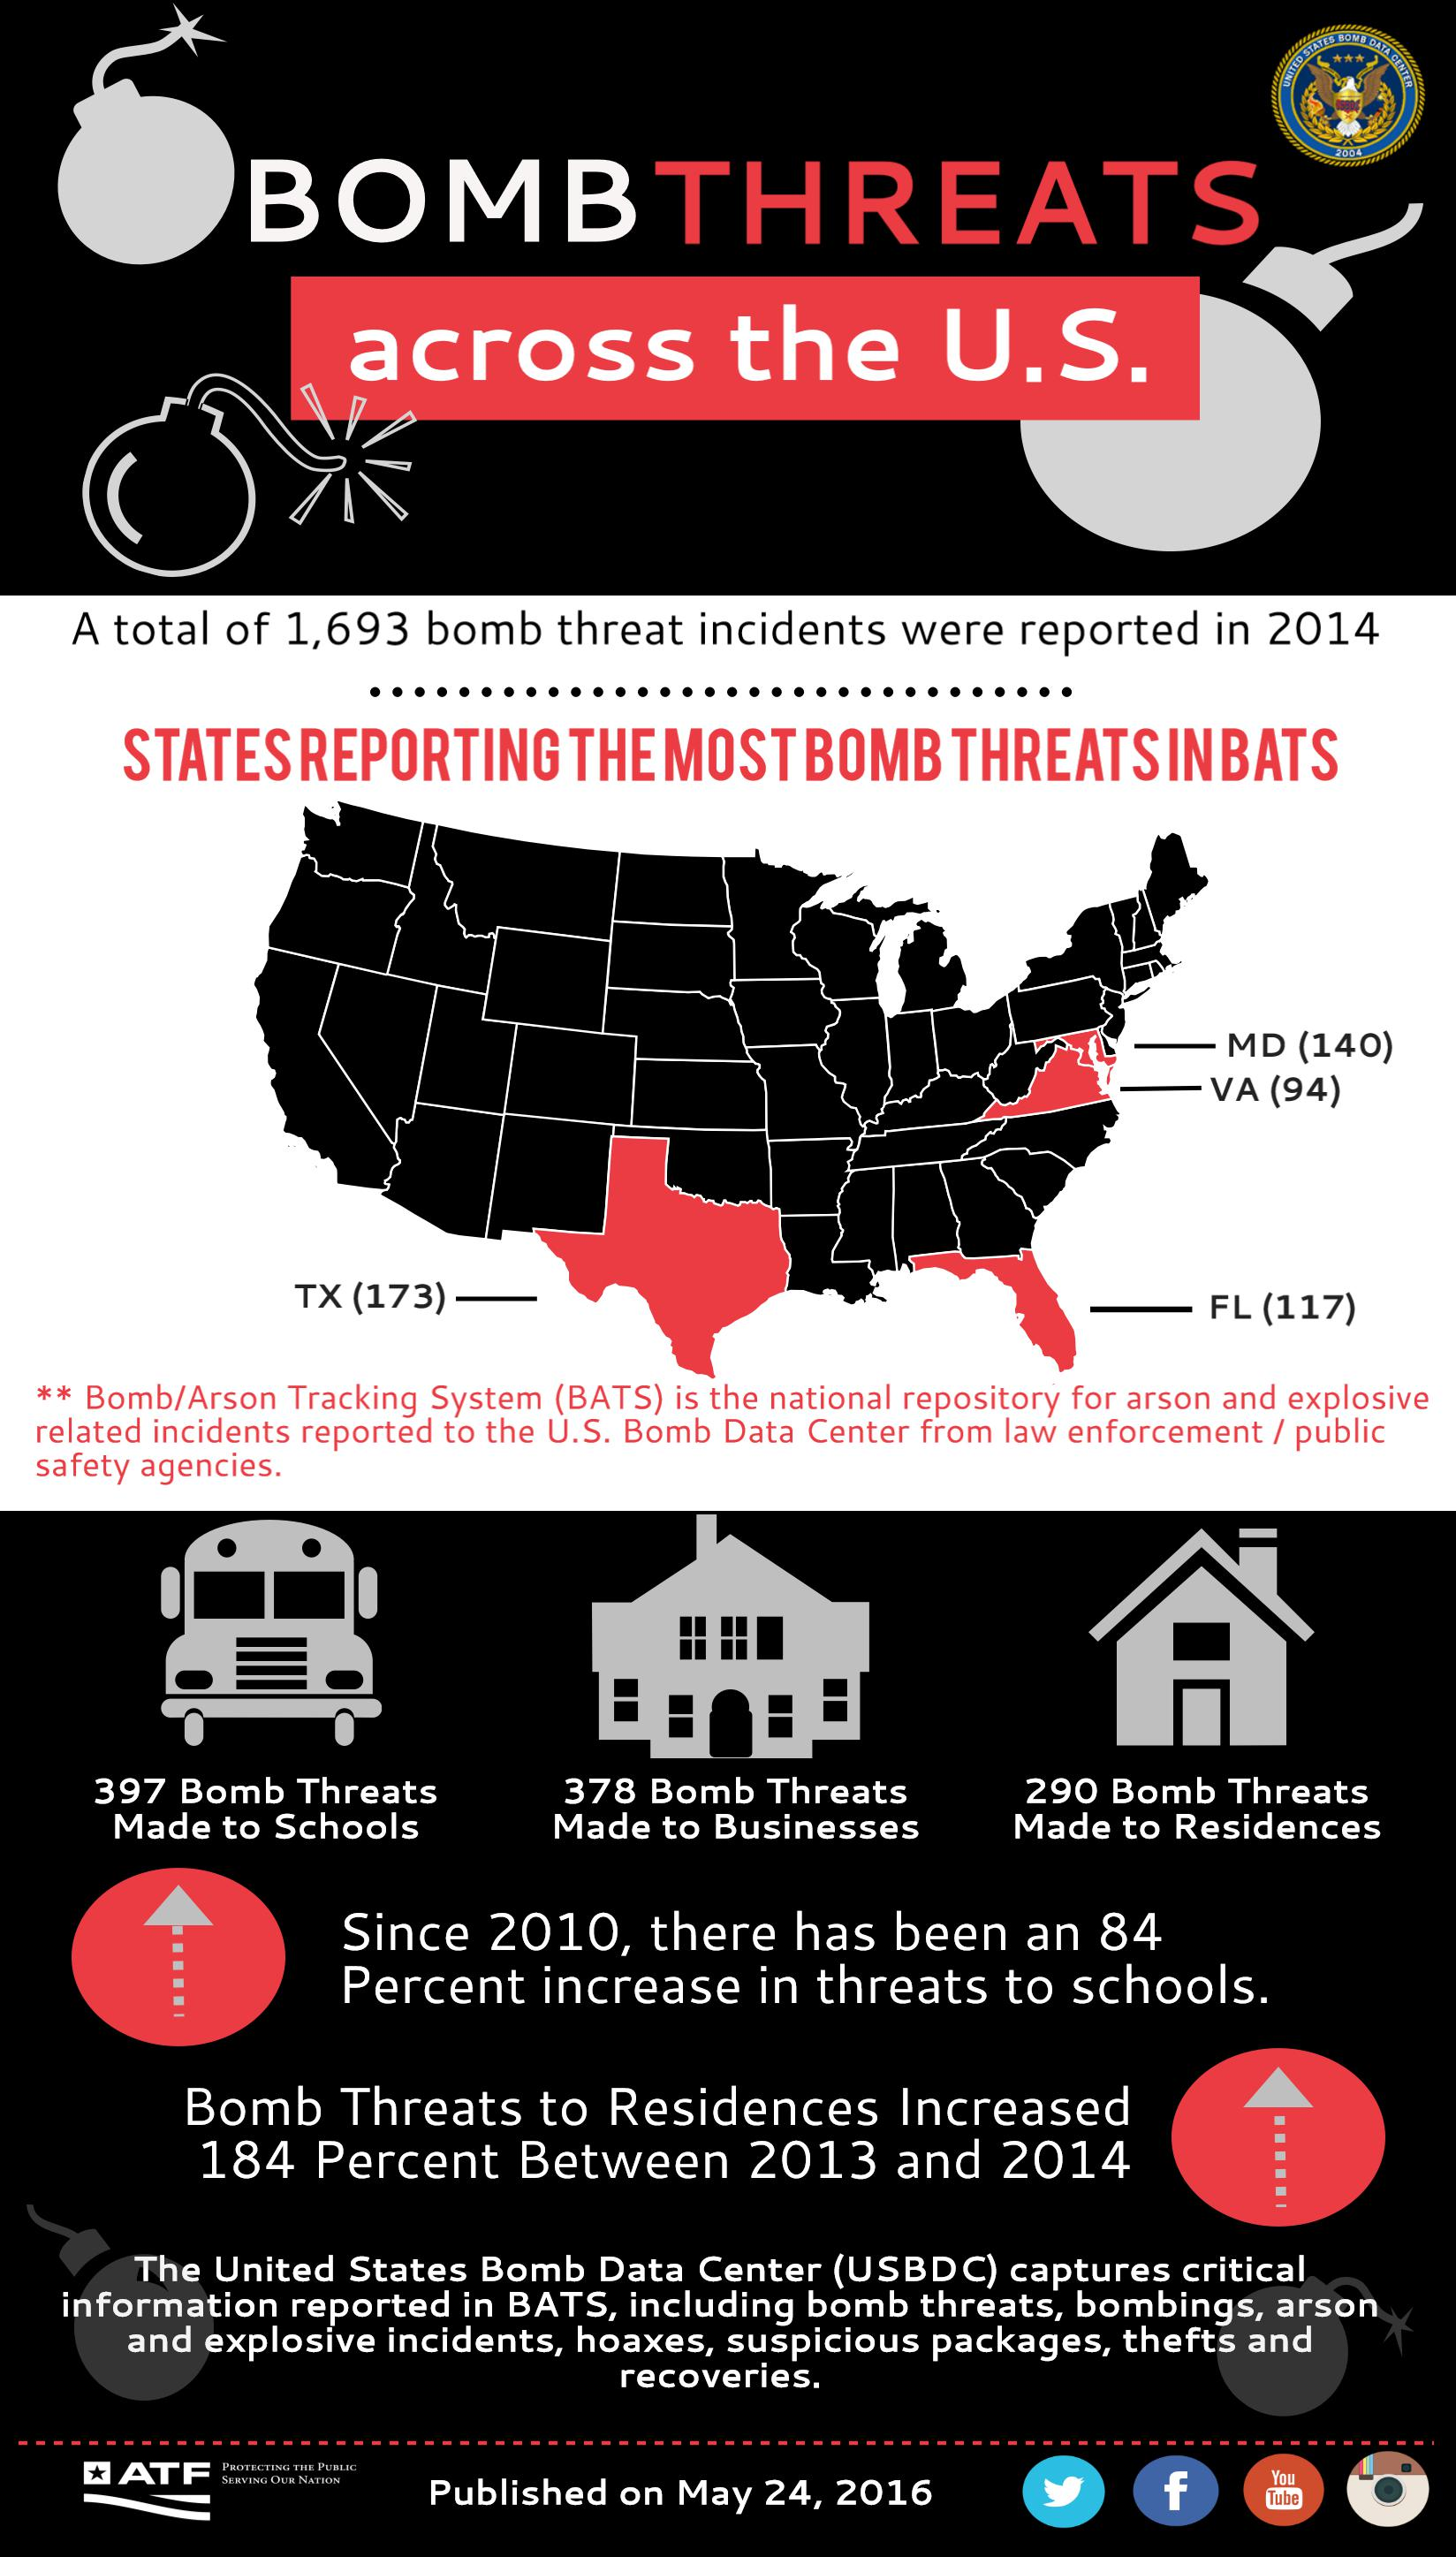 Bomb Threats Across the U.S.